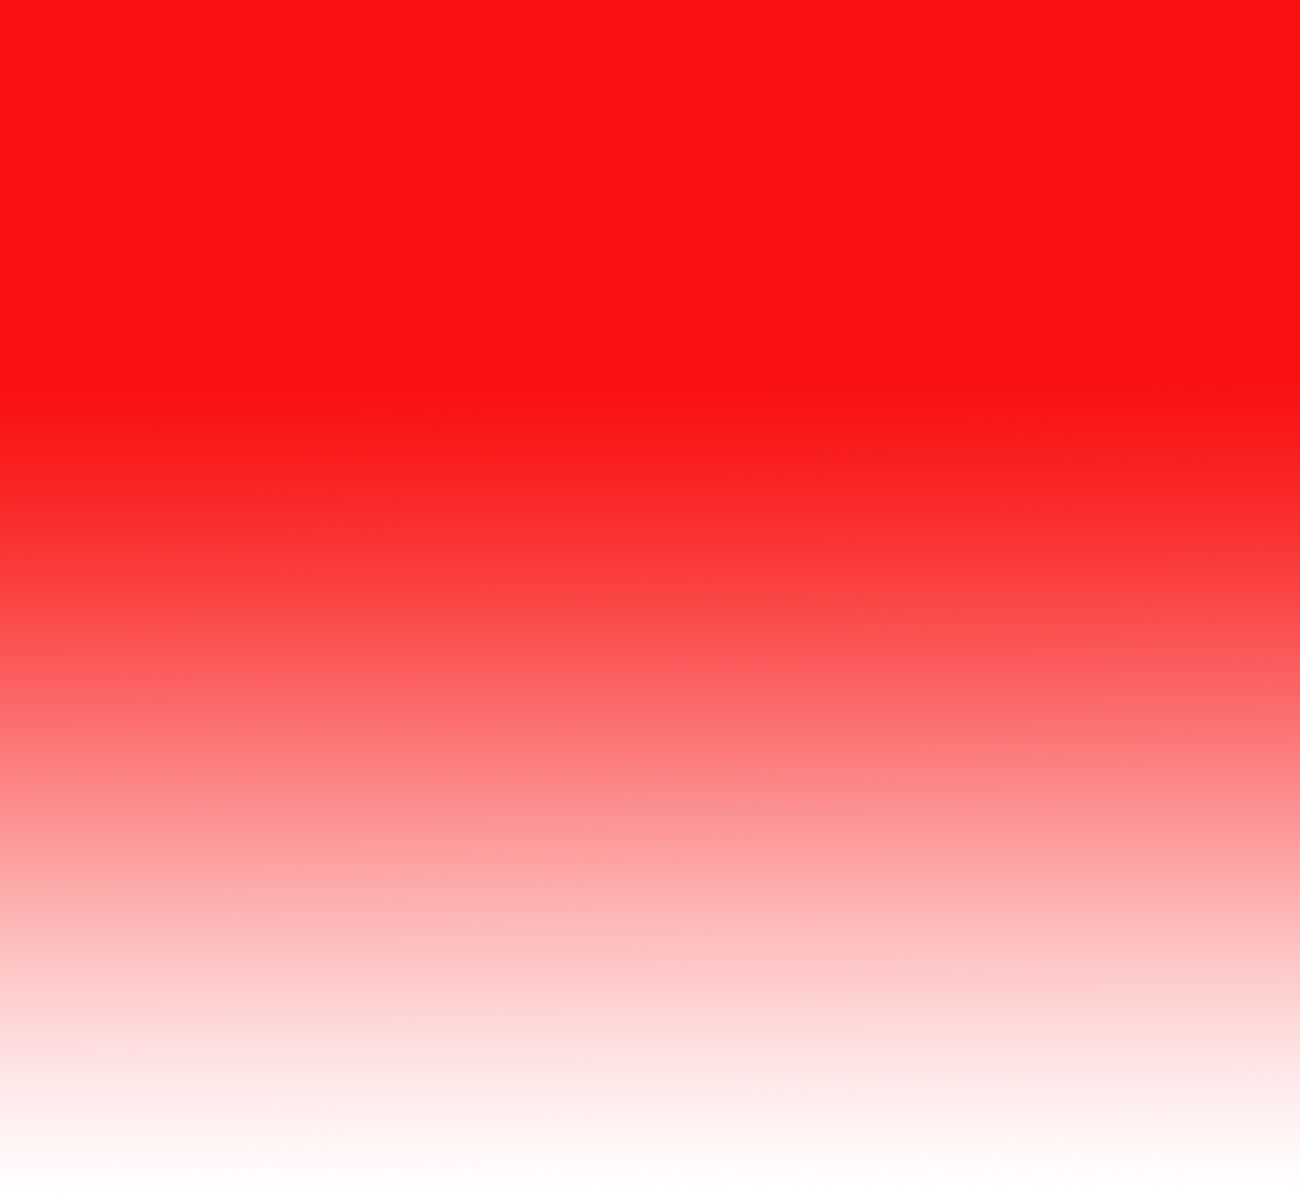 Gradient Abstract Logo Template: [50+] Red Gradient Wallpaper On WallpaperSafari